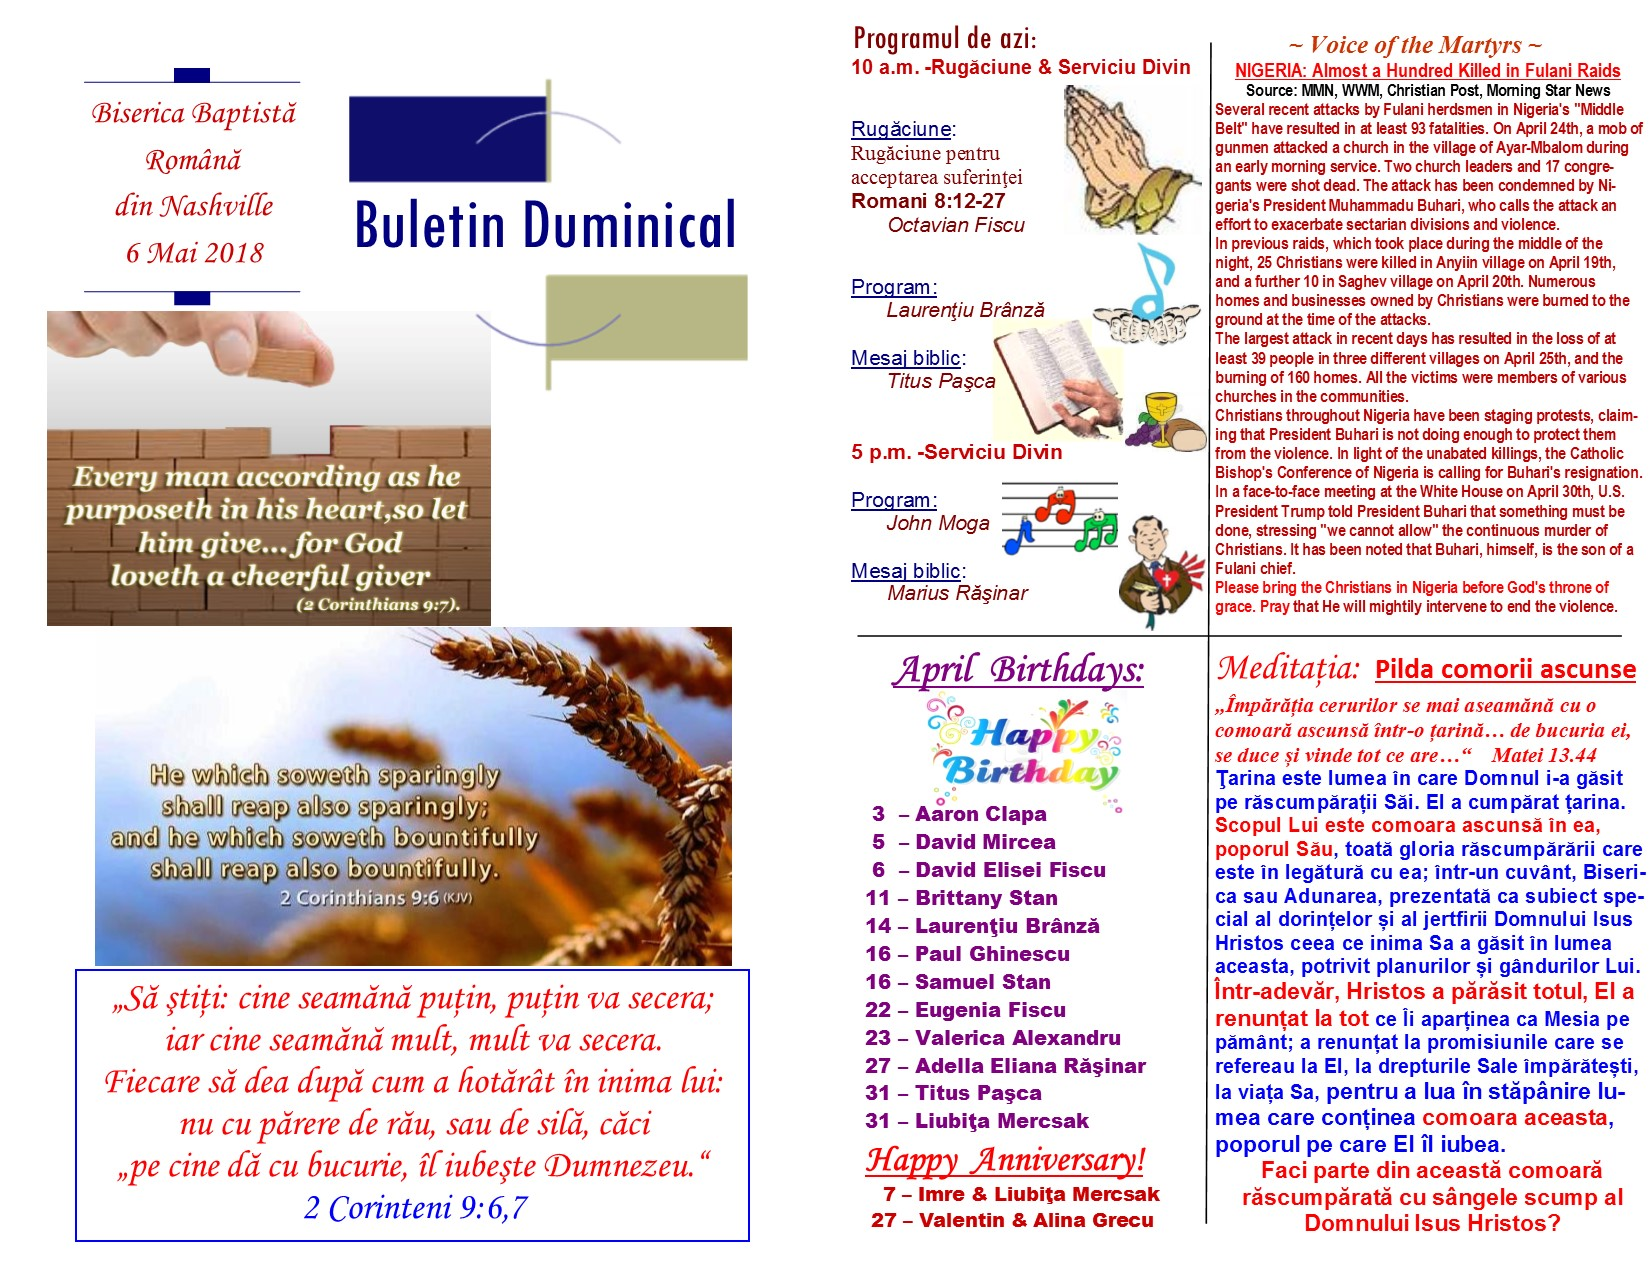 Buletin 05-06-18 page 1 & 2